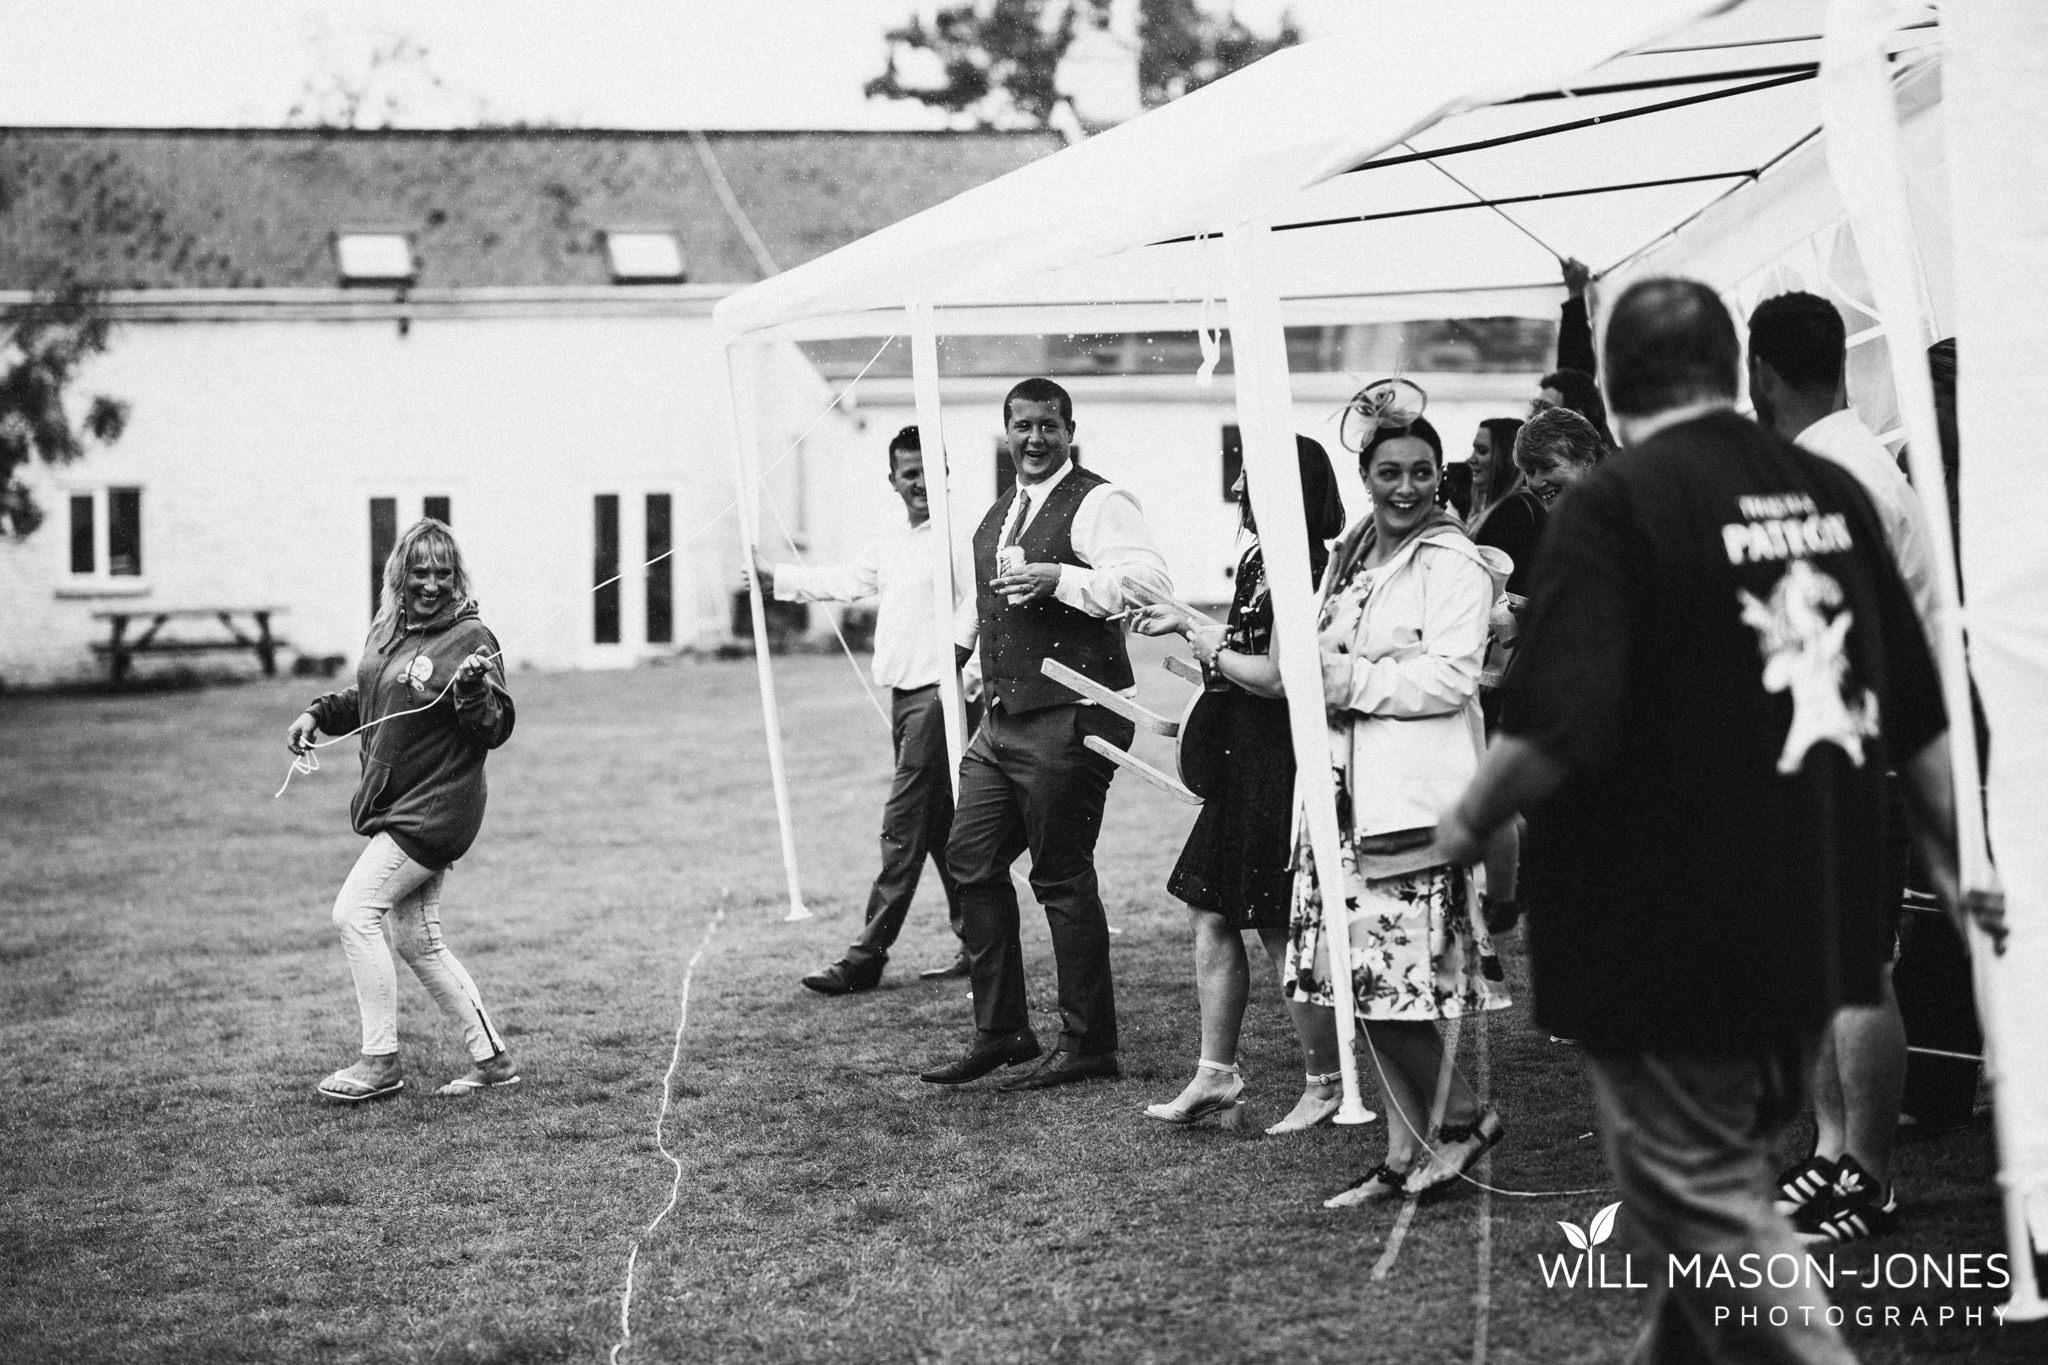 outdoor-wet-rainy-wedding-uk-swansea-photography-13.jpg